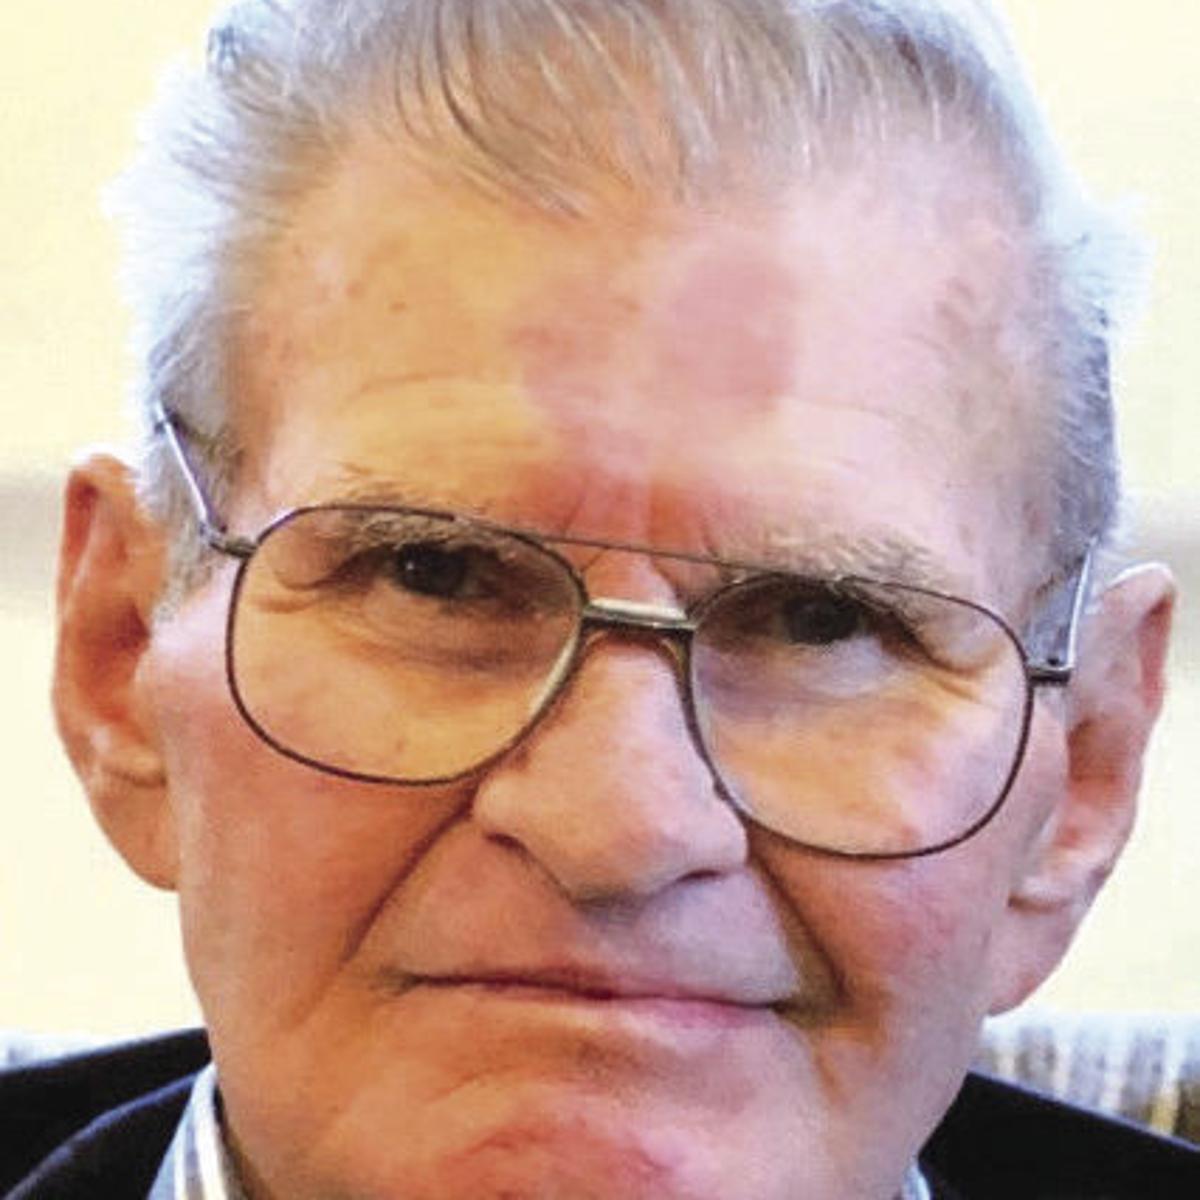 Nancy Bea Porno taylor jr., earl lee | obituaries | dailyprogress